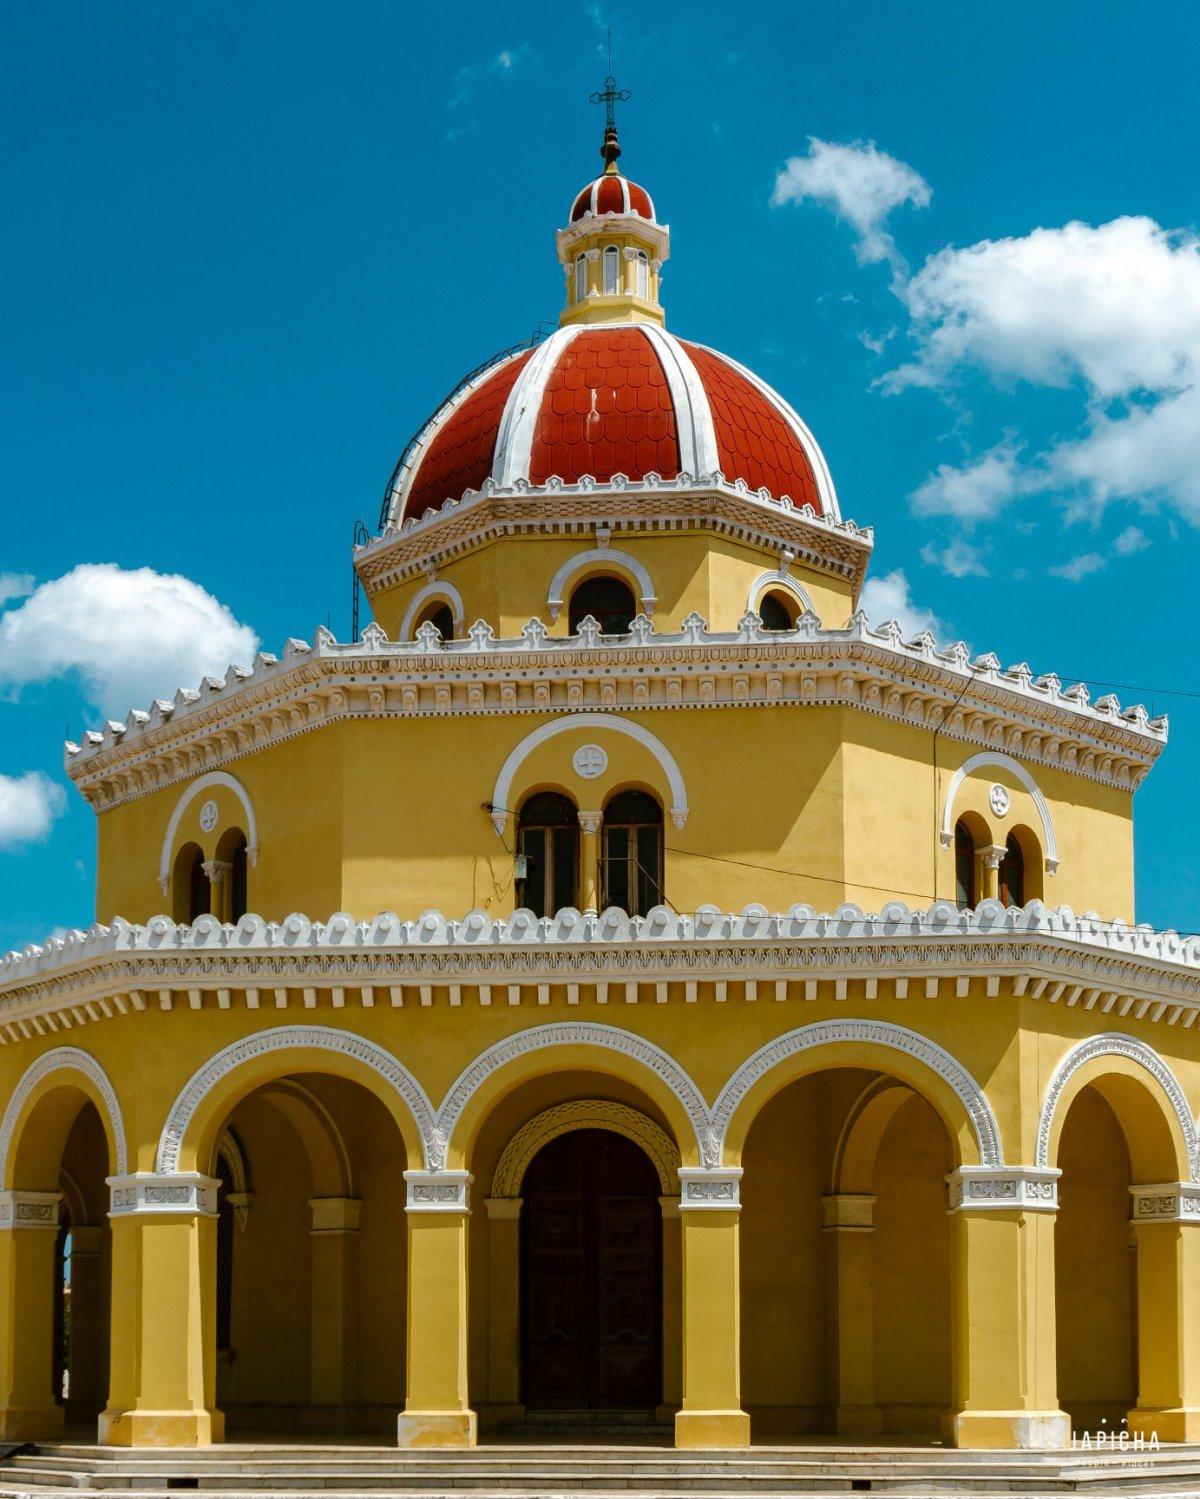 The Colon Heroes Cemetary in Havana | by Japicha